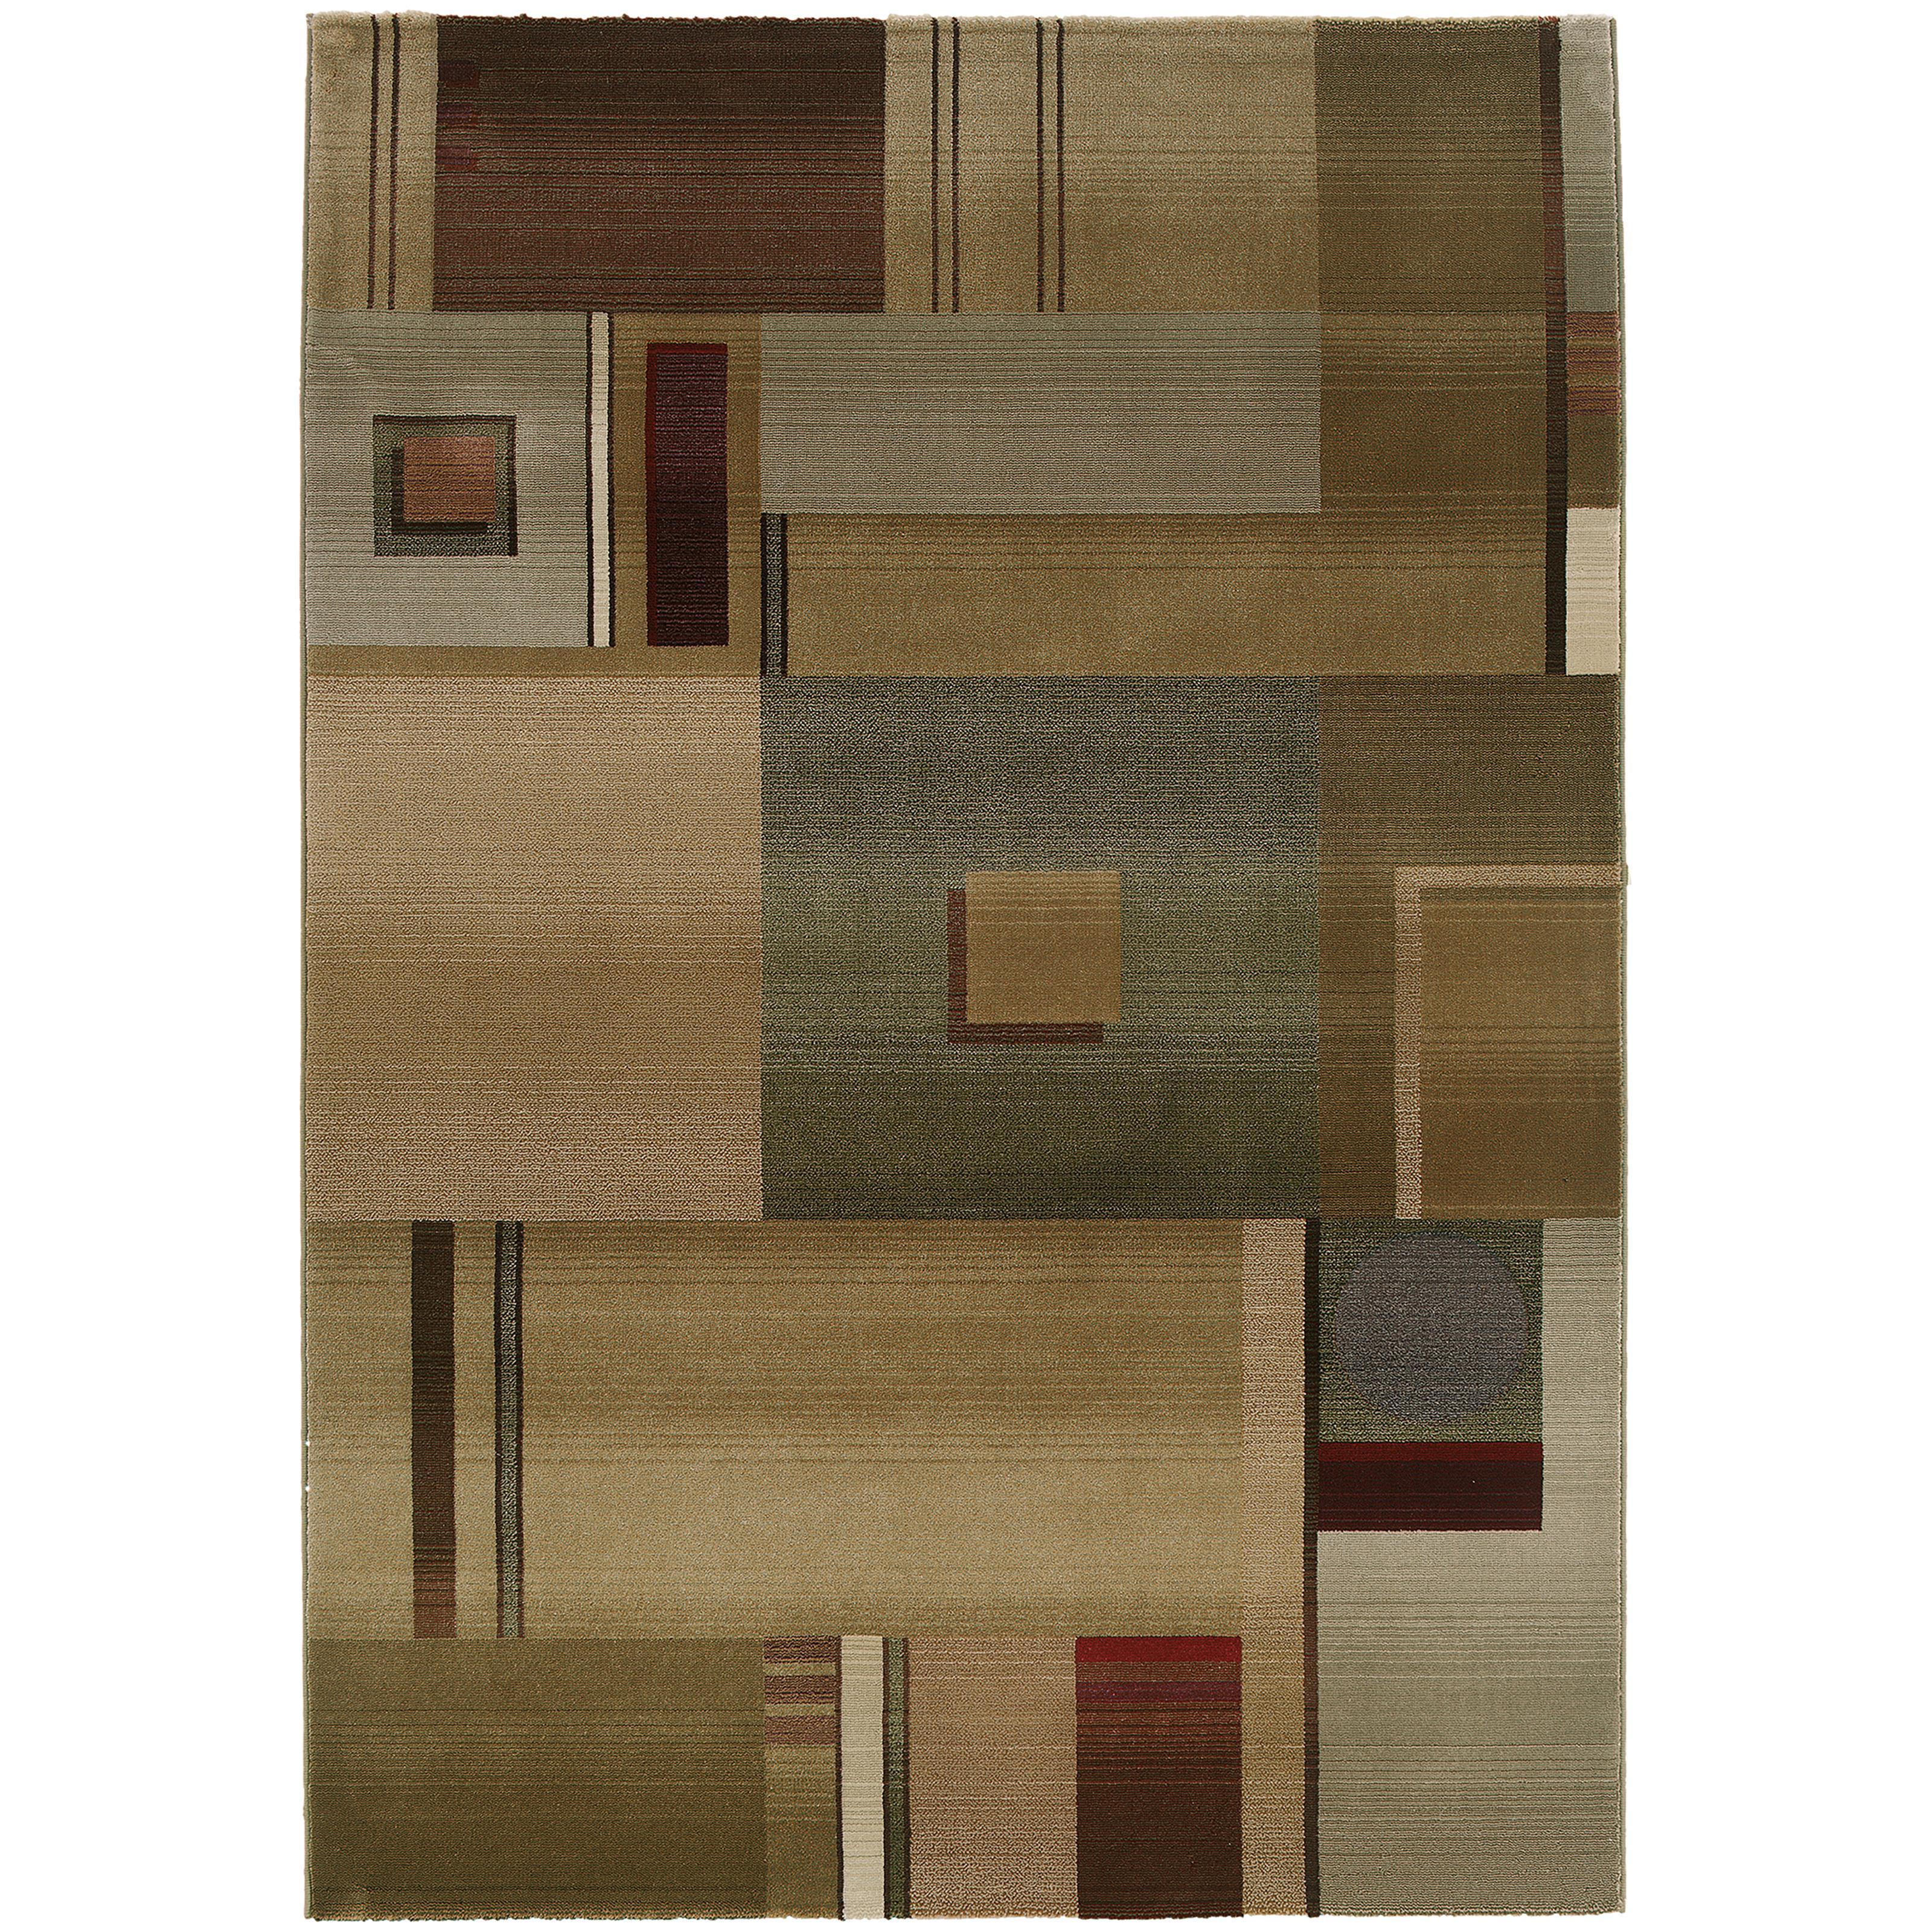 "Oriental Weavers Generations 7'10"" X 11' Rug - Item Number: G157G1240340ST"